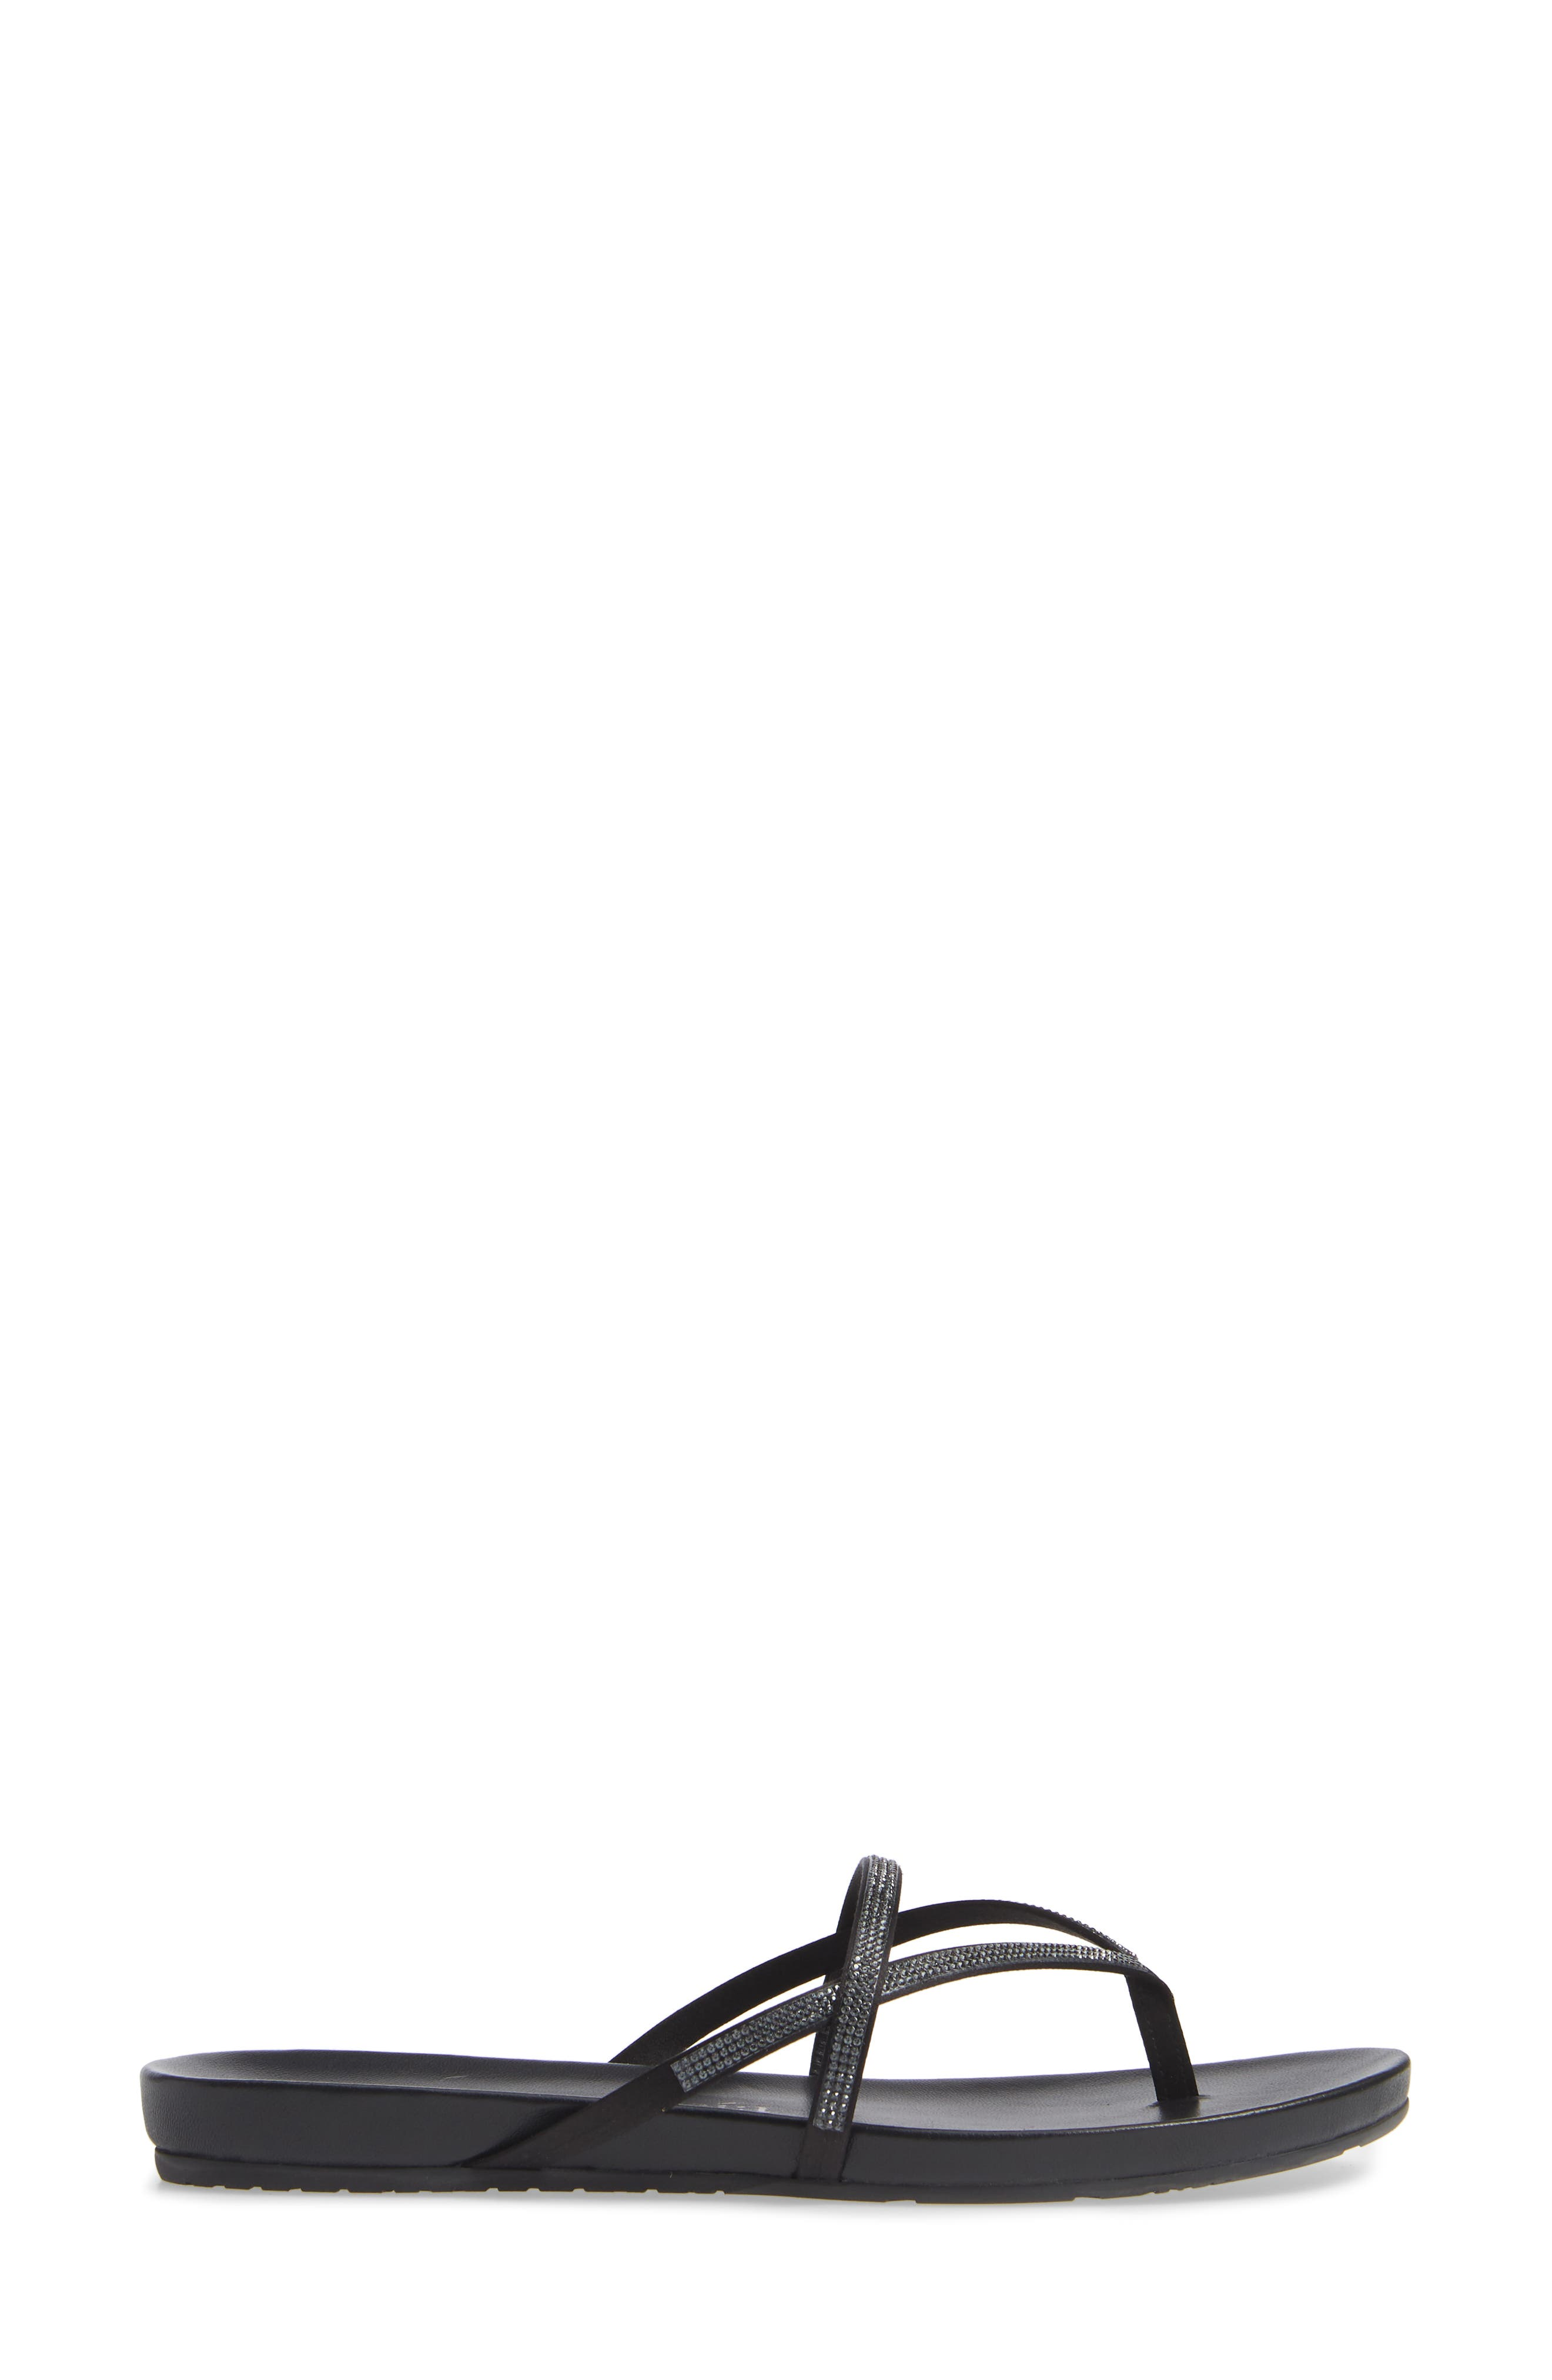 Giulia Crystal Embellished Sandal,                             Alternate thumbnail 3, color,                             METEORITE SATIN